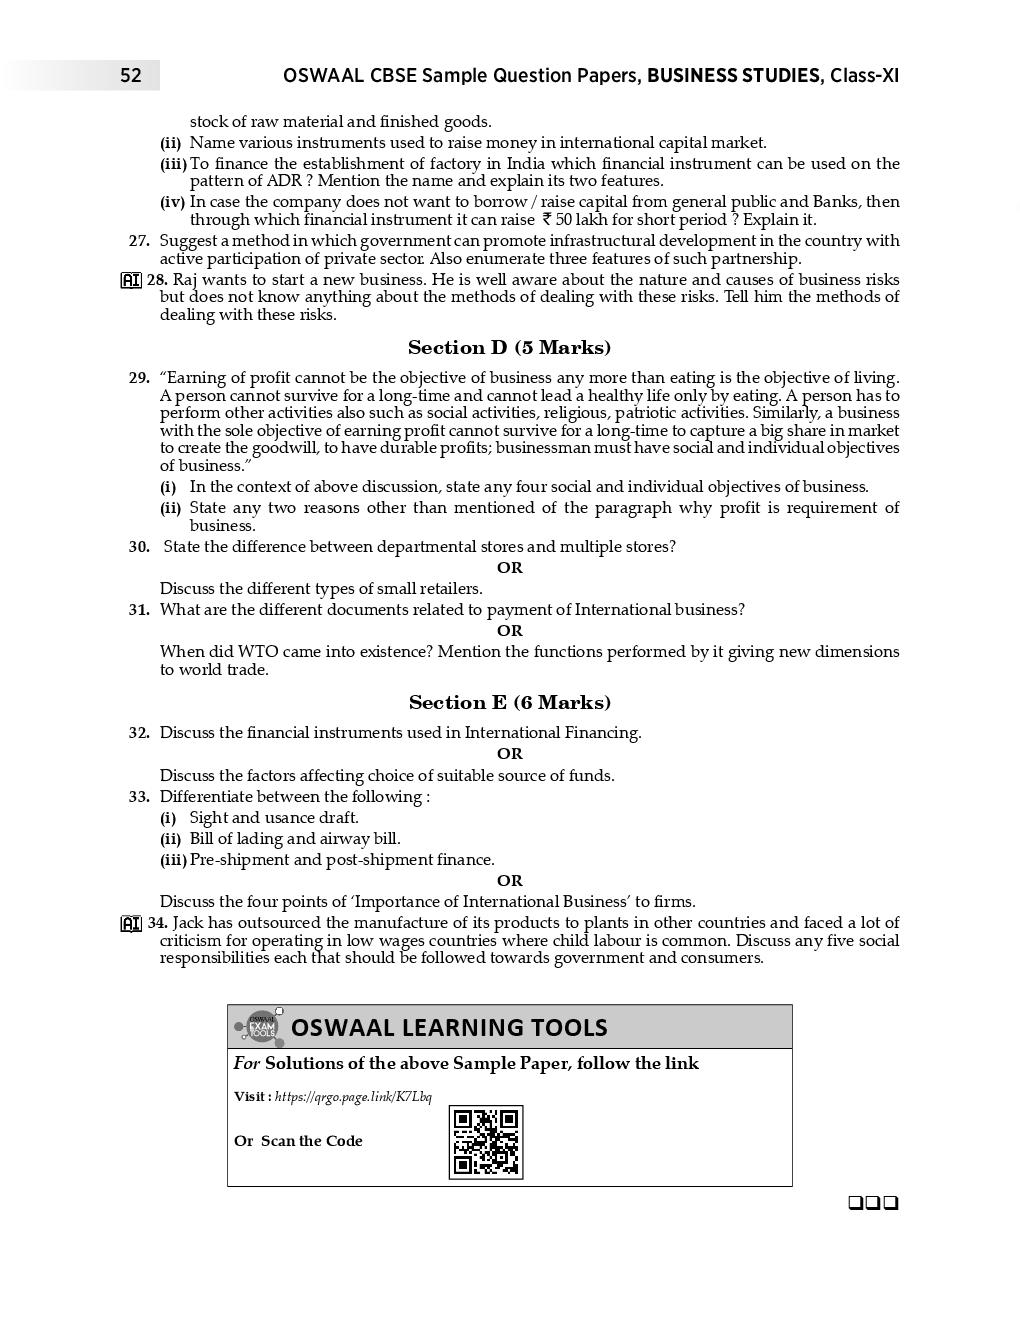 Resume builder for ex offenders